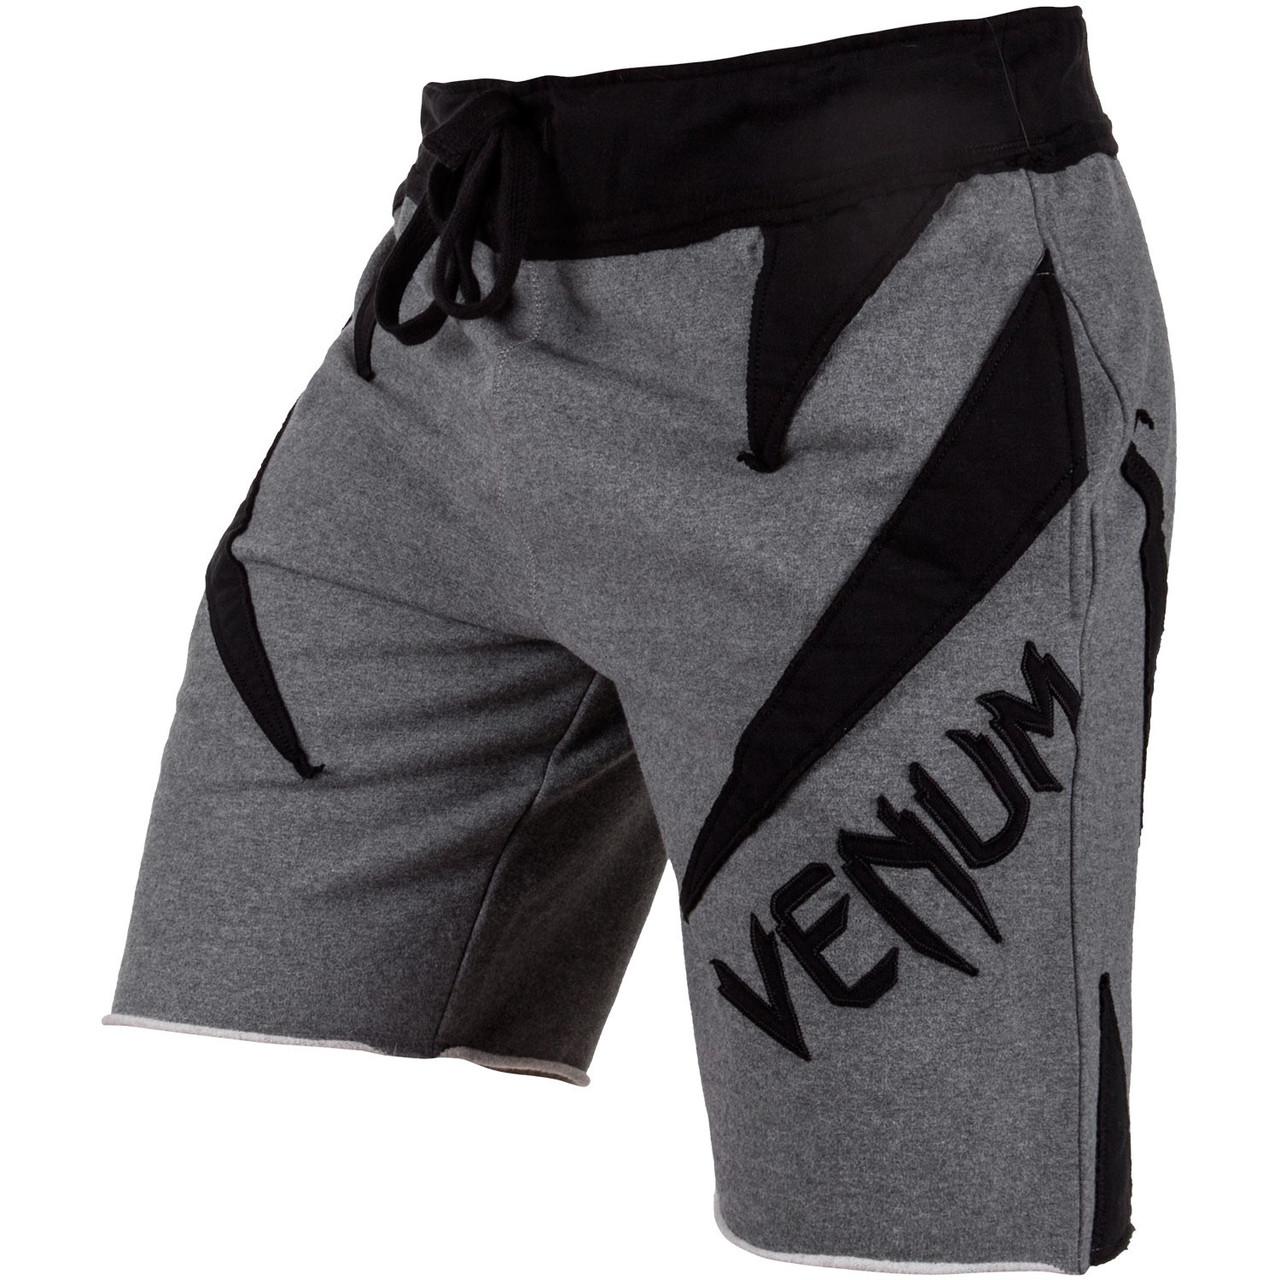 Шорты Venum Jaws Cotton Training Shorts Grey Black